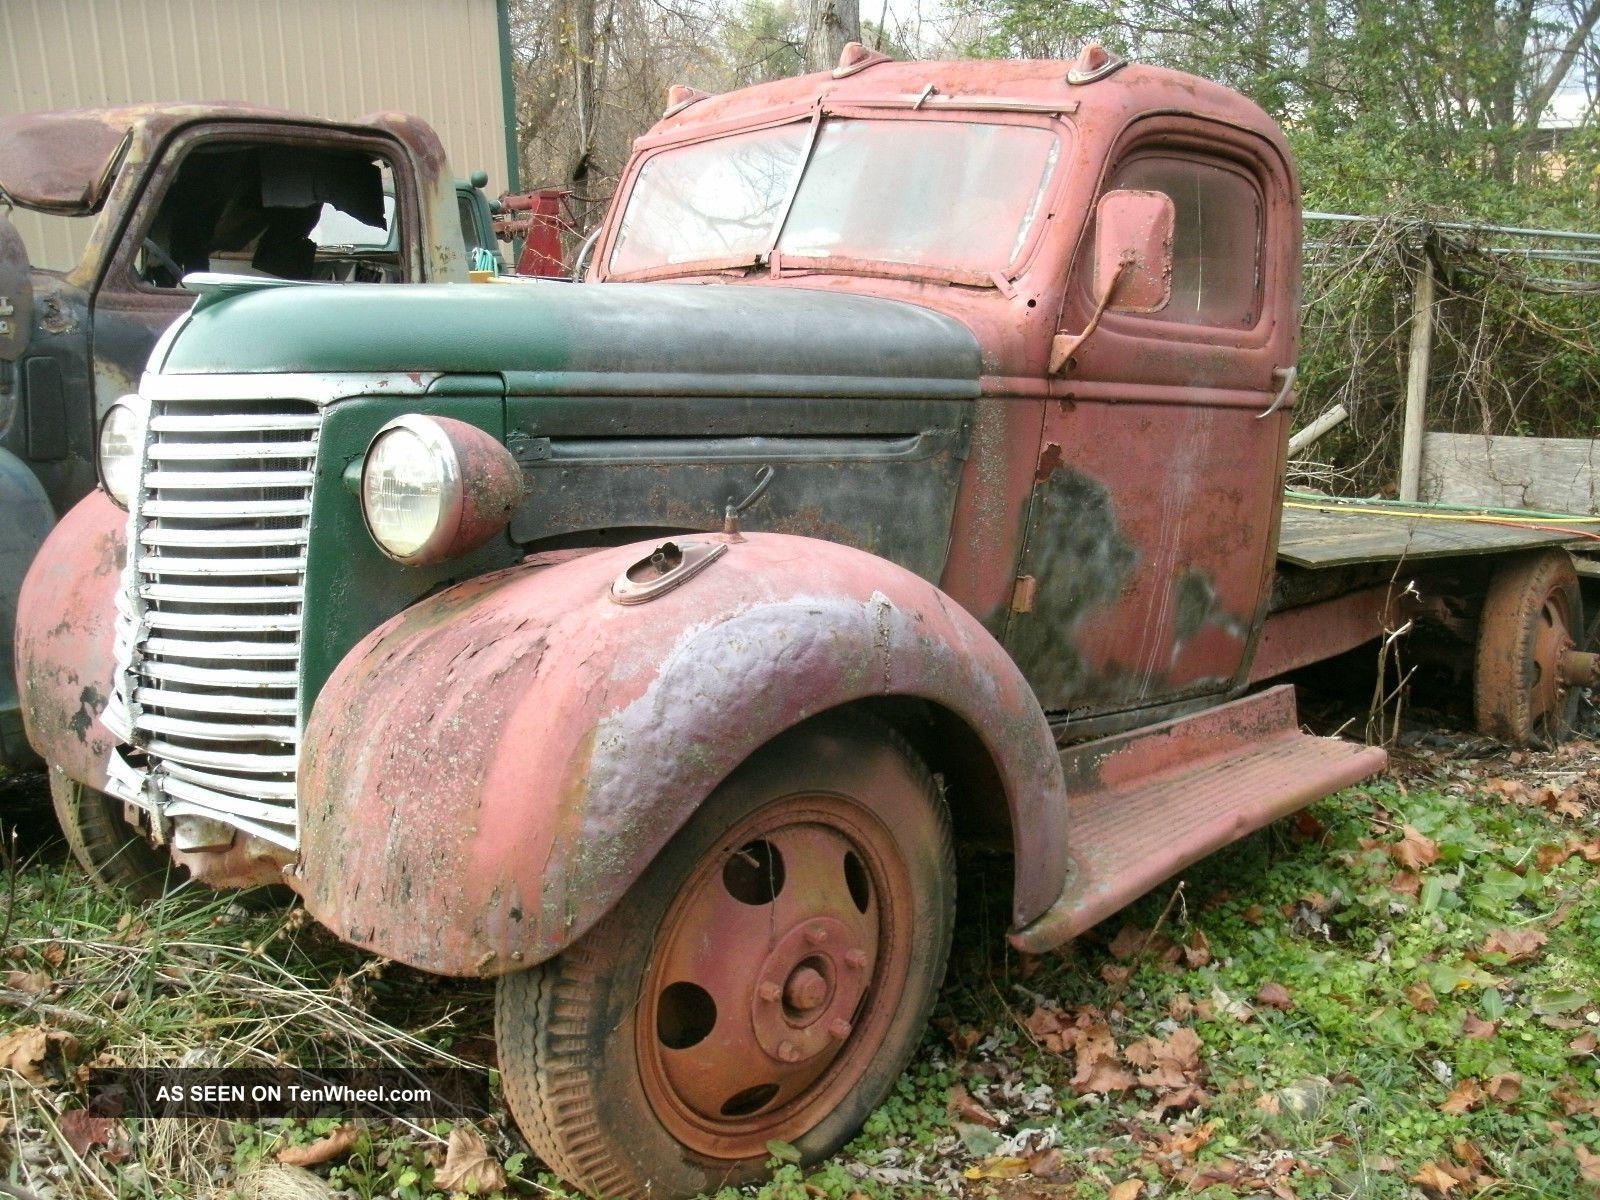 1939 Chevrolet 1 5 Ton Truck For Restore Or Hot Rod Carhauler 1950 Cadillac Wiring Diagram